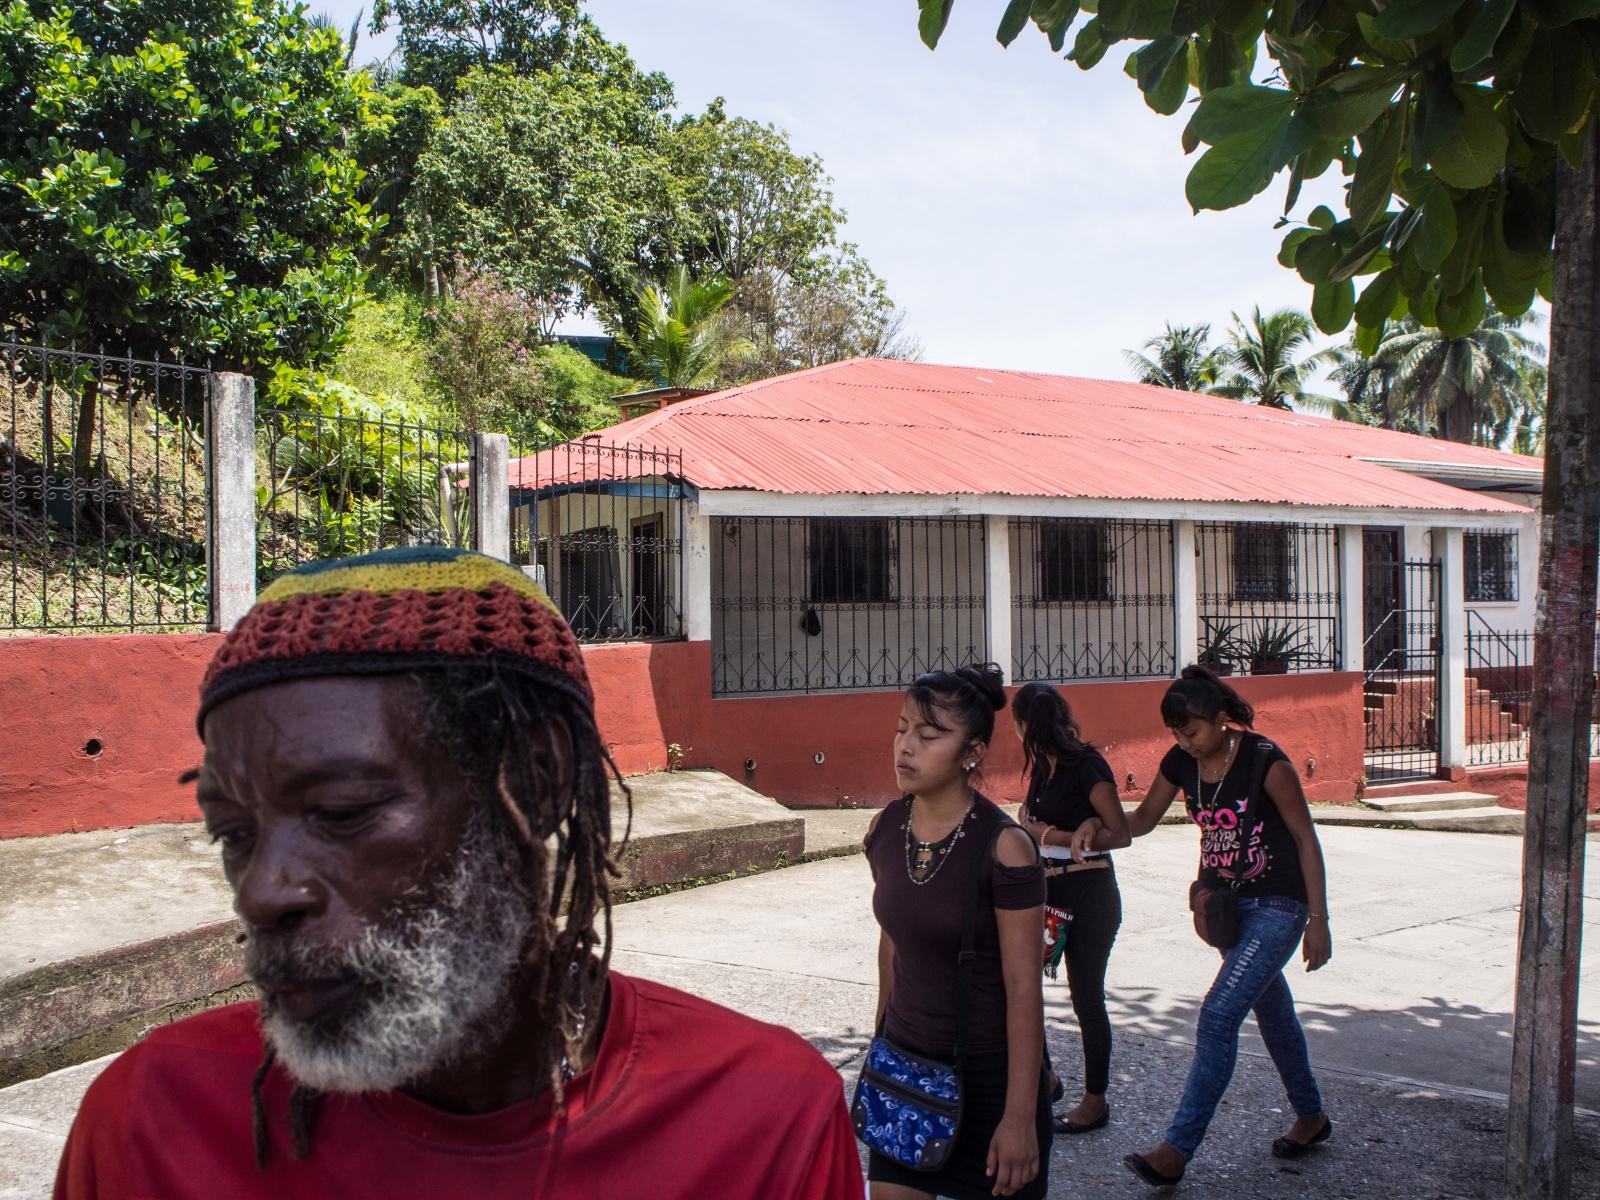 LIVINGSTON, GUATEMALA - AUGUST 2018